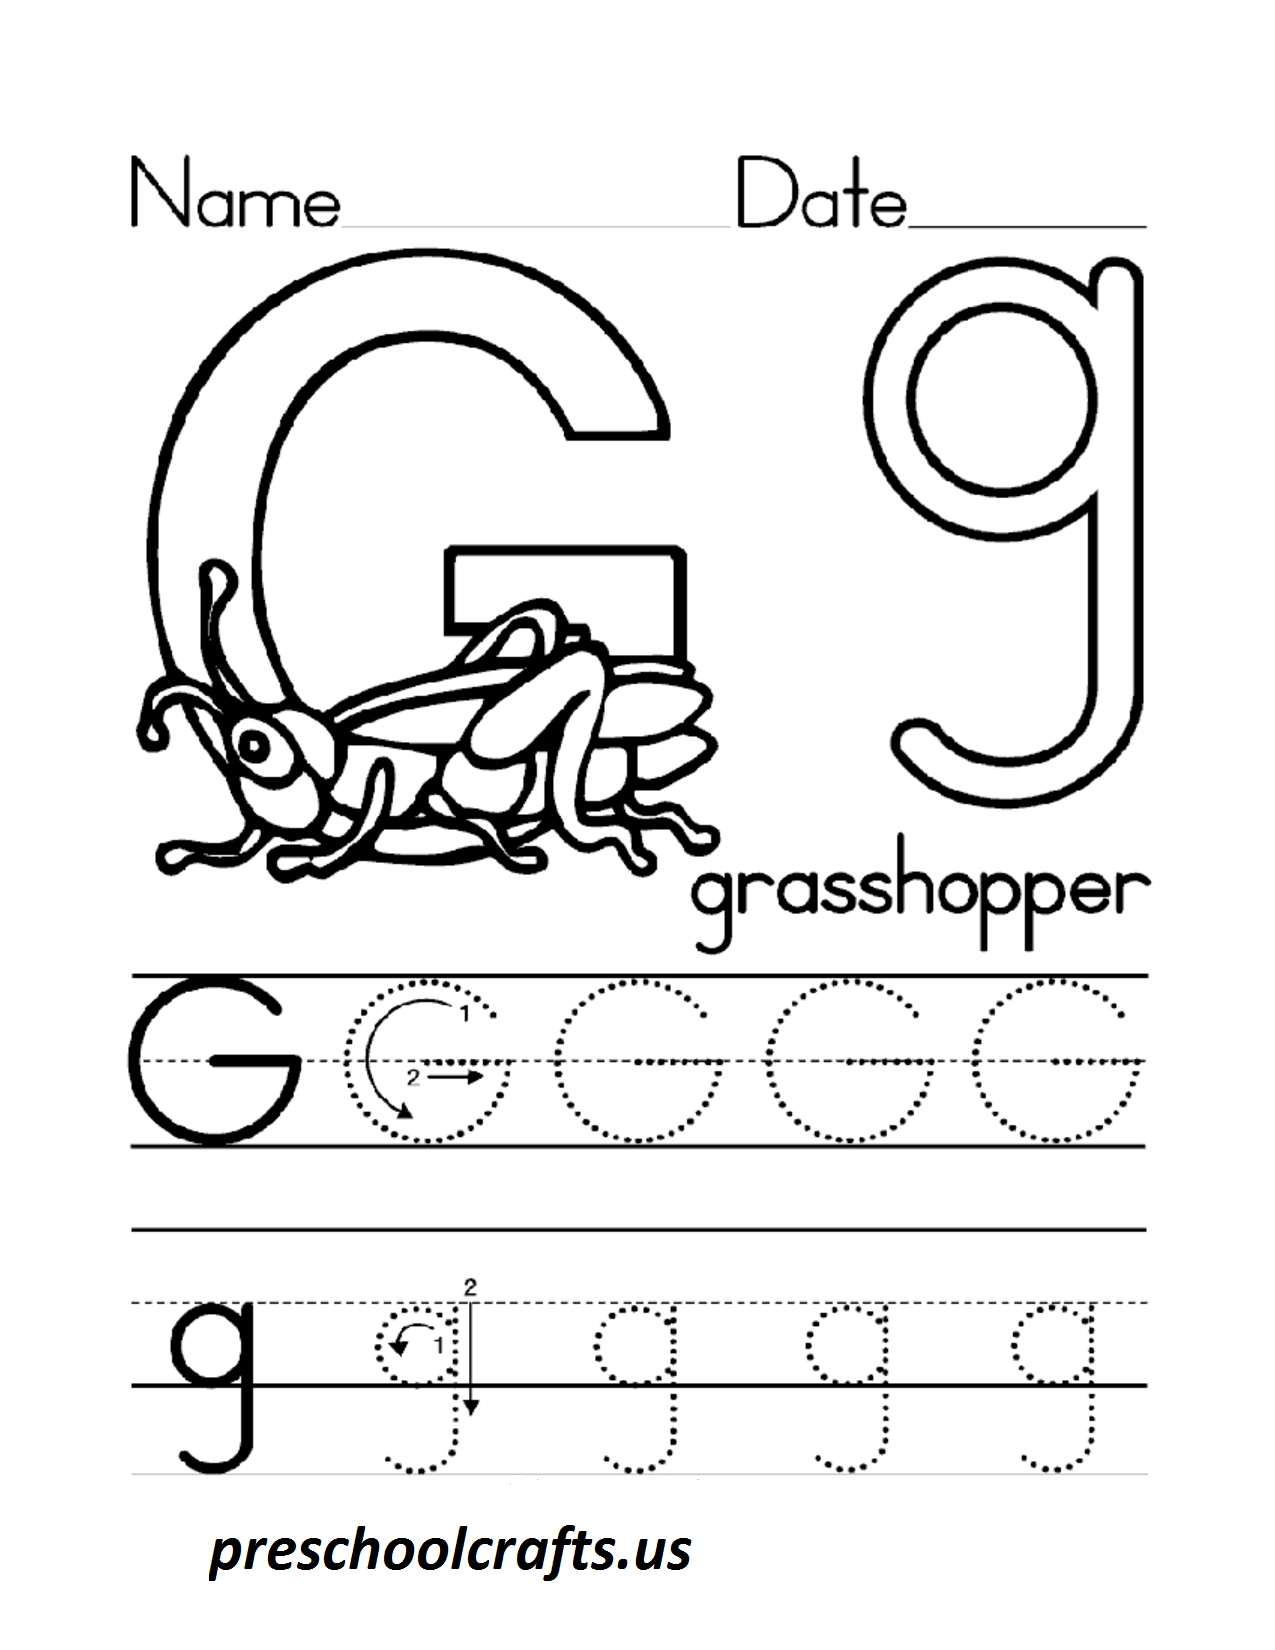 G Worksheets For Preschool